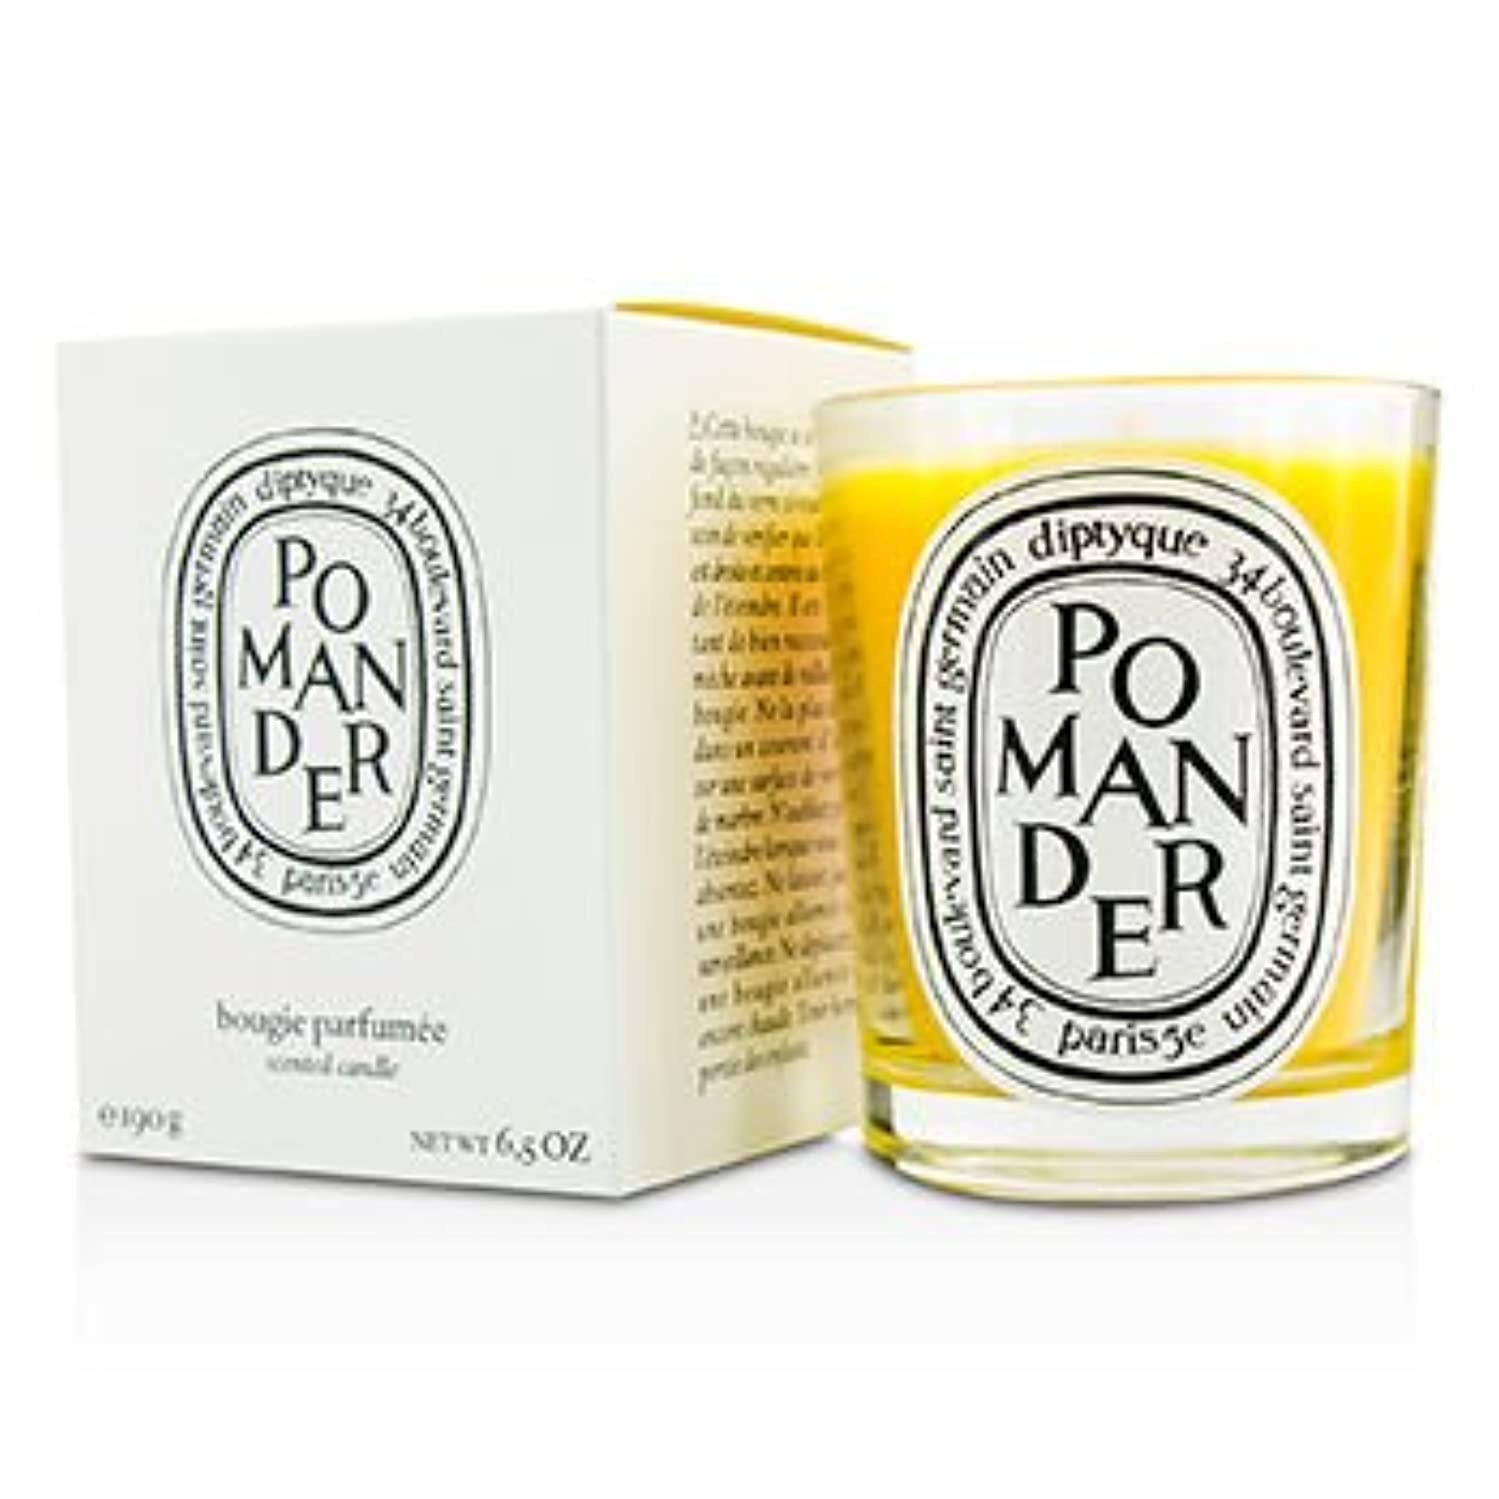 [Diptyque] Scented Candle - Pomander 190g/6.5oz